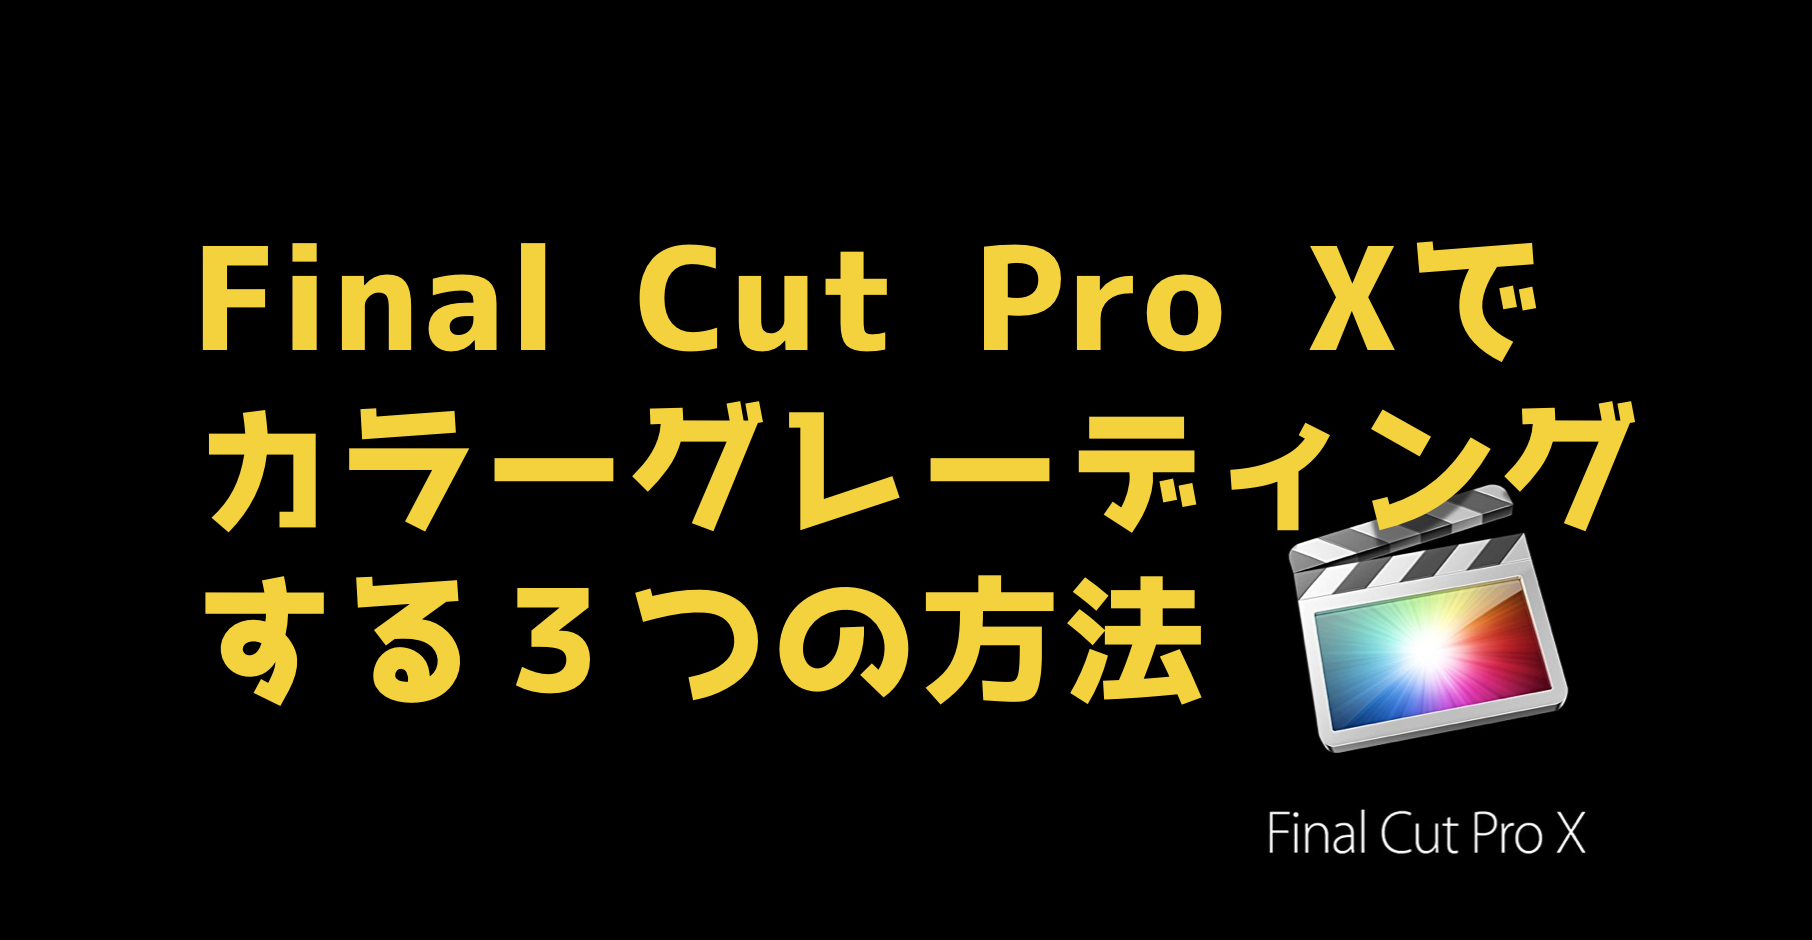 Final Cut Pro Xでカラーグレーディングする3つの方法